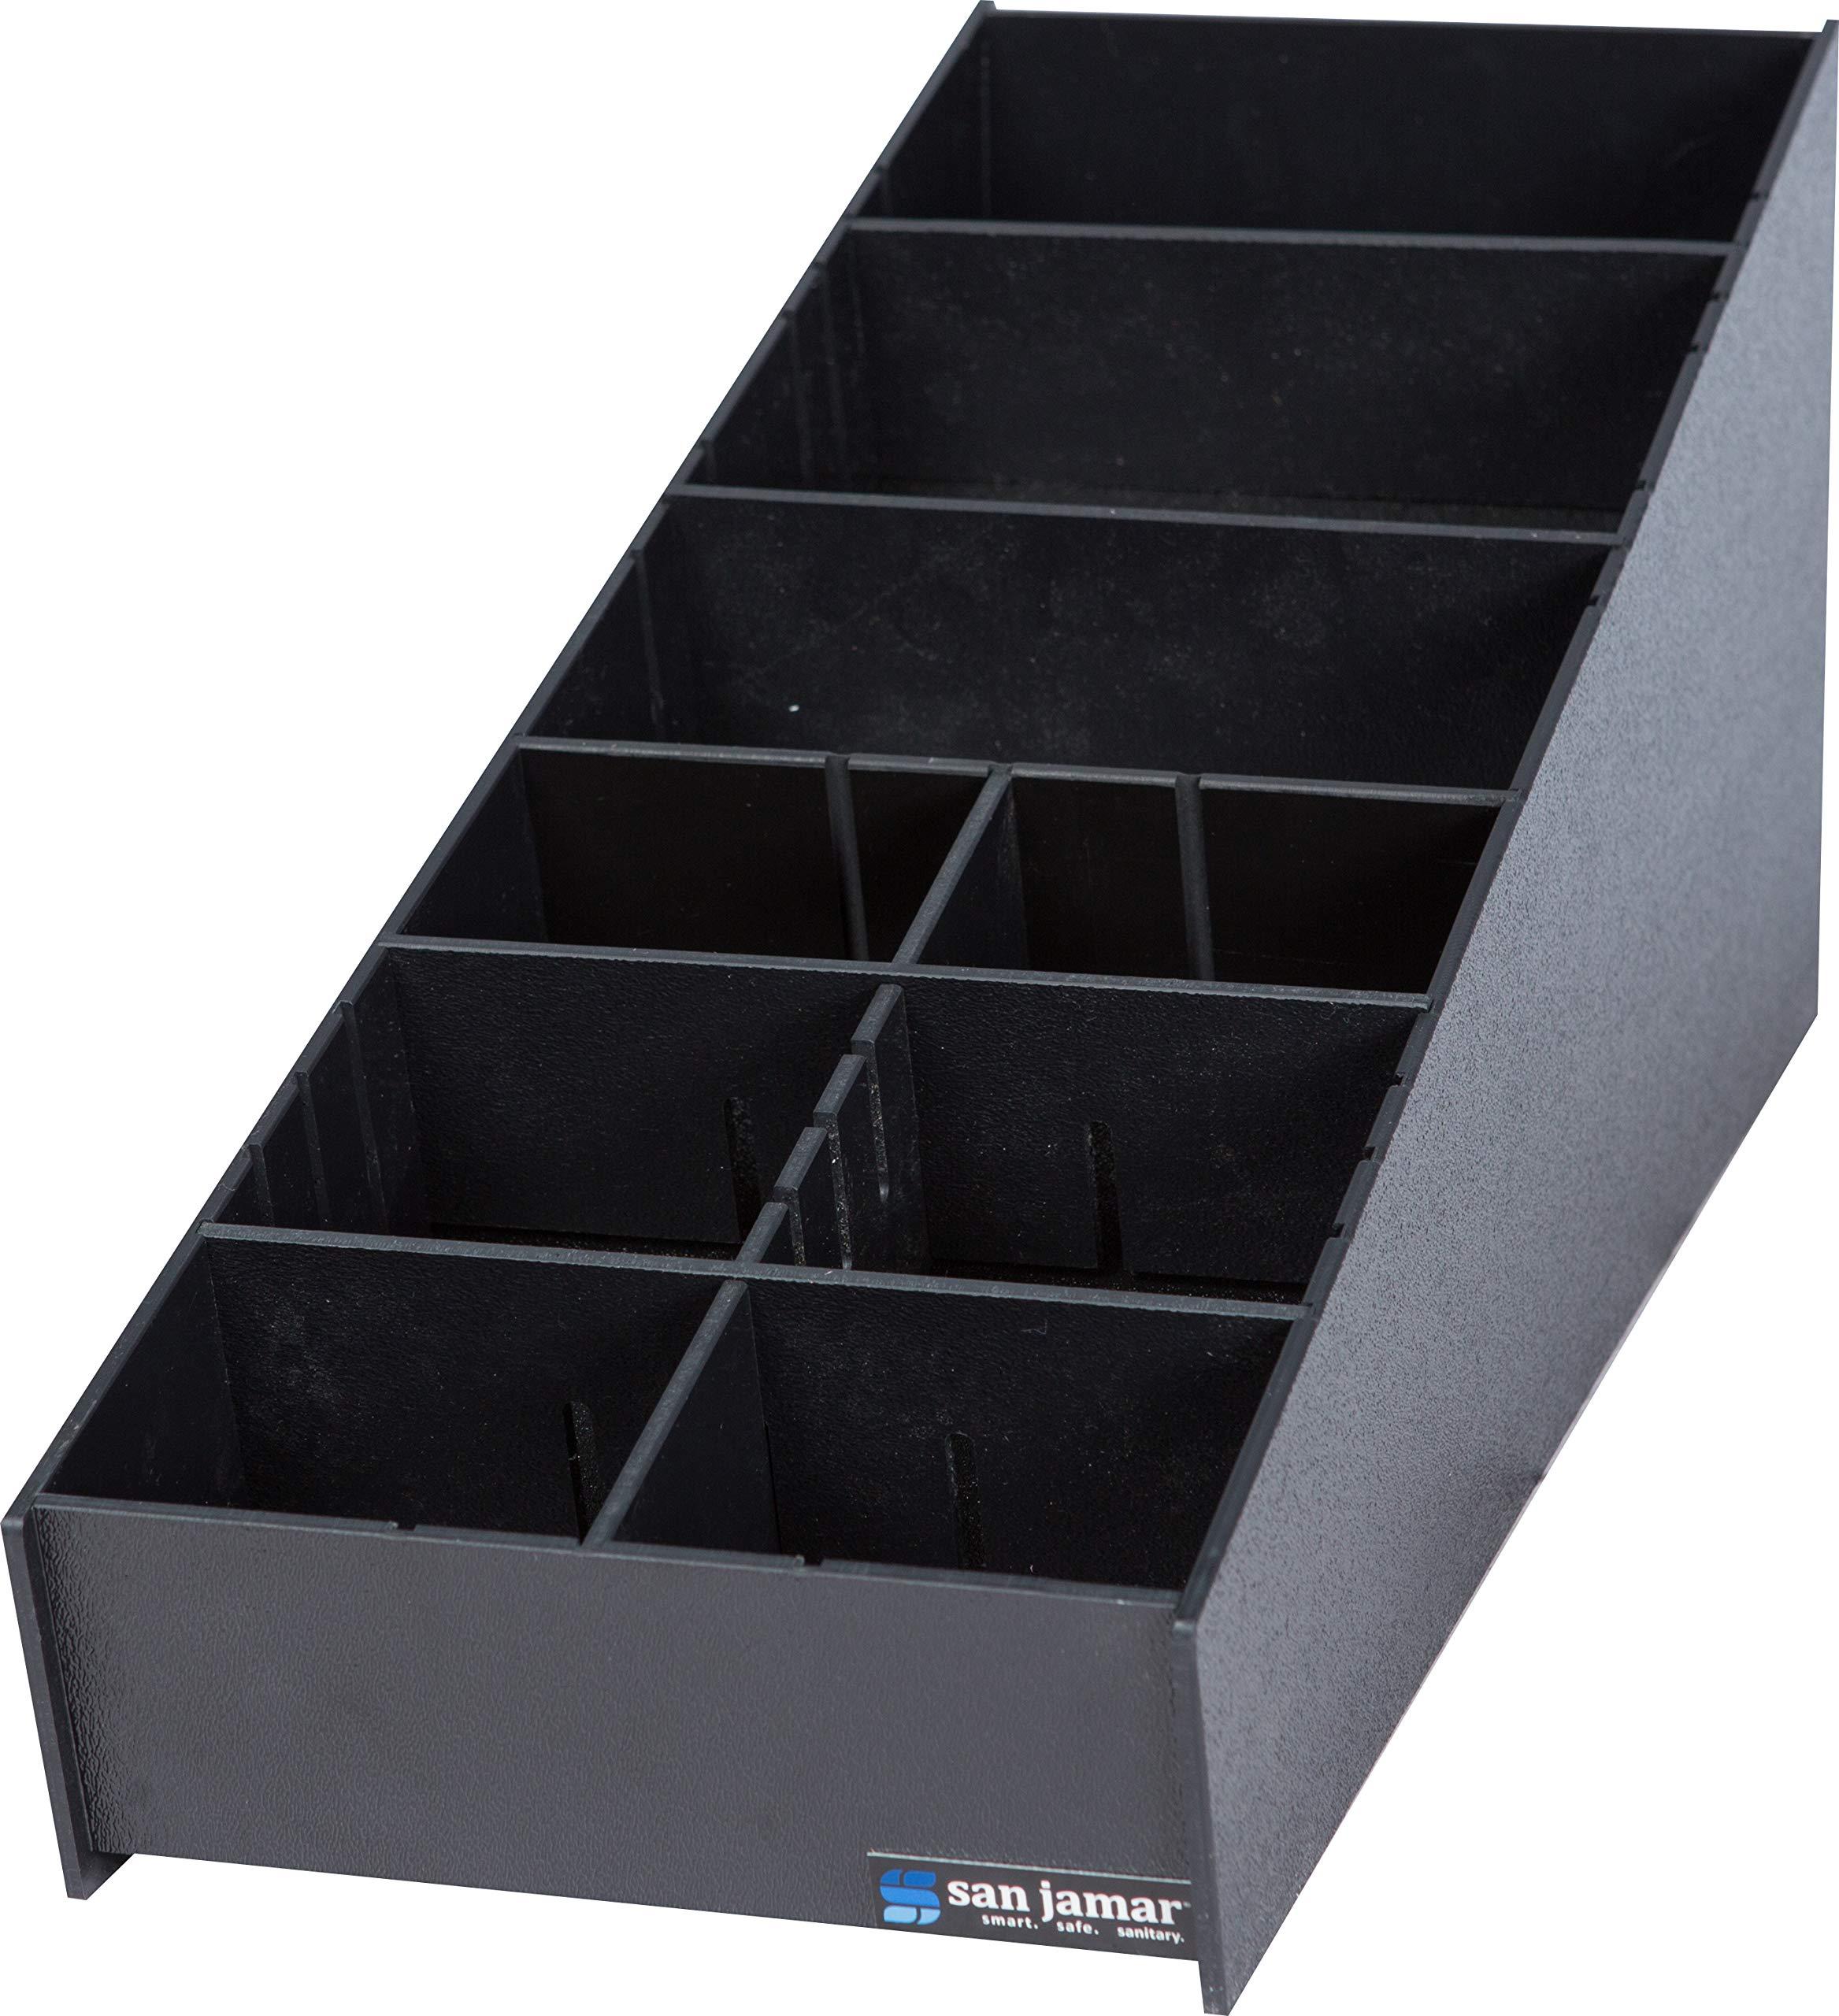 San Jamar L2900 Polystyrene Dimension Condiment and Straw Organizer, 8-3/16'' Width x 9-1/2'' Height x 25-1/16'' Depth, Black